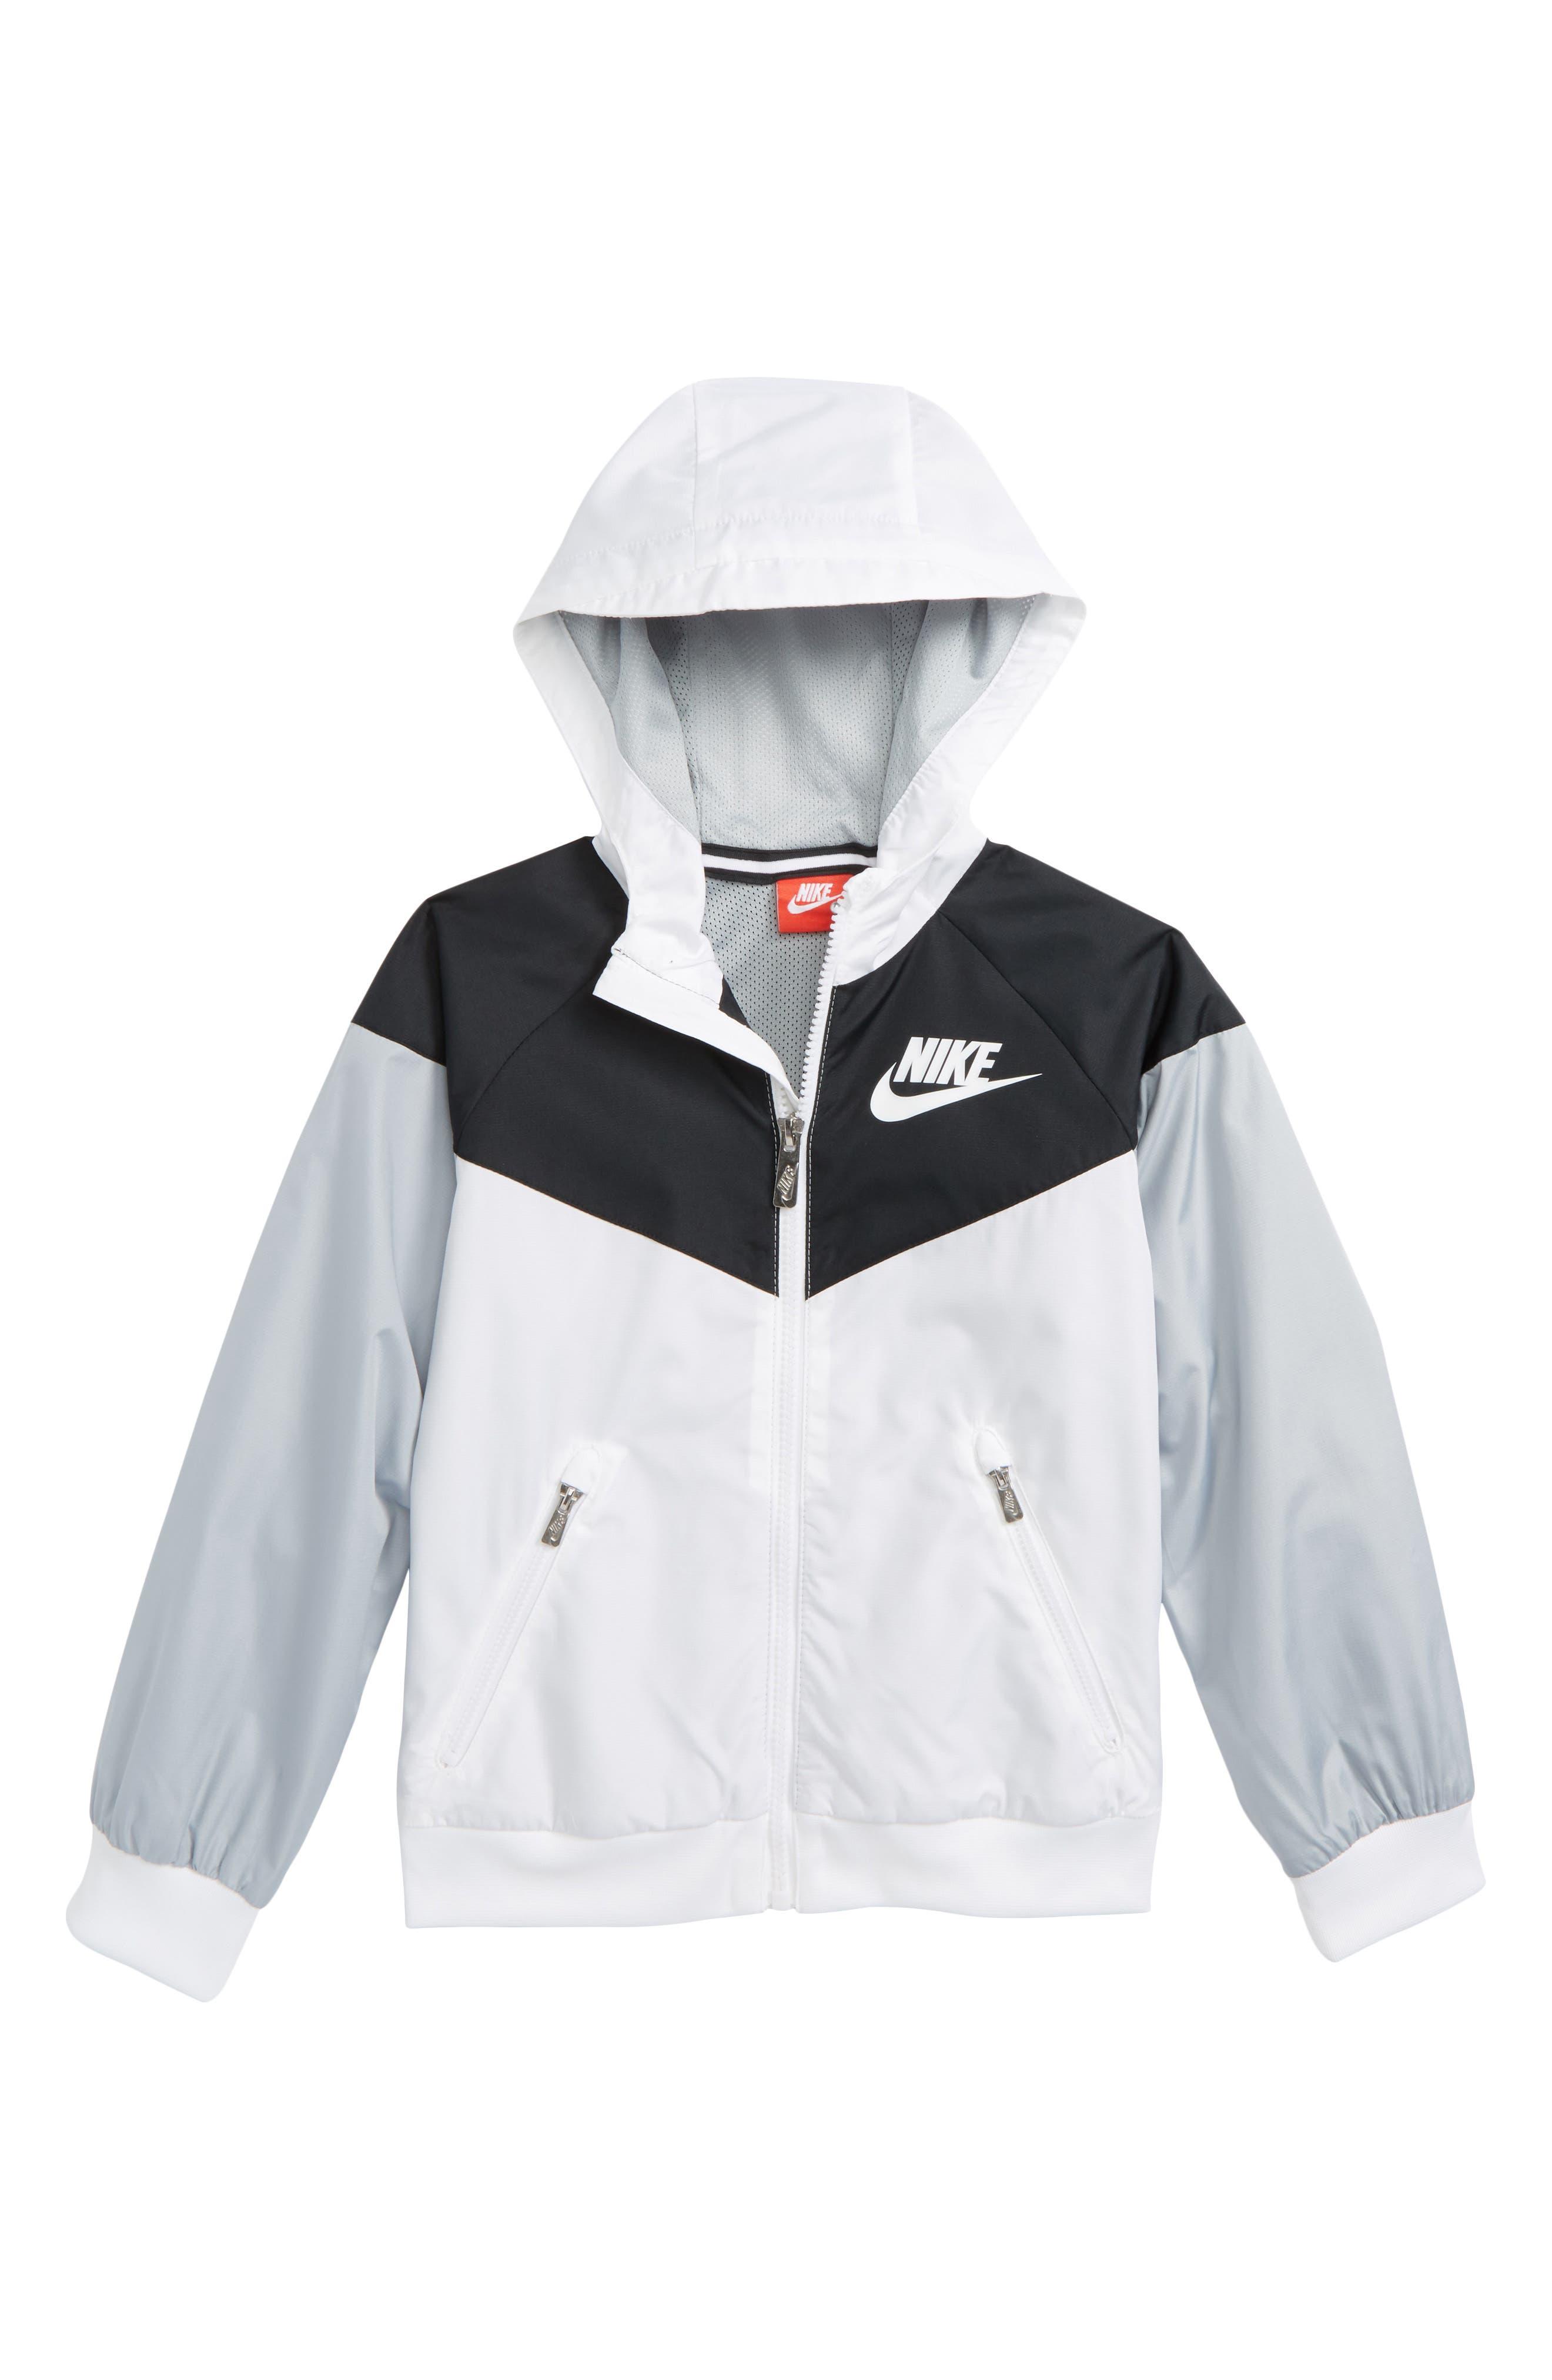 44fadb143a12 Kids  Coats   Jackets